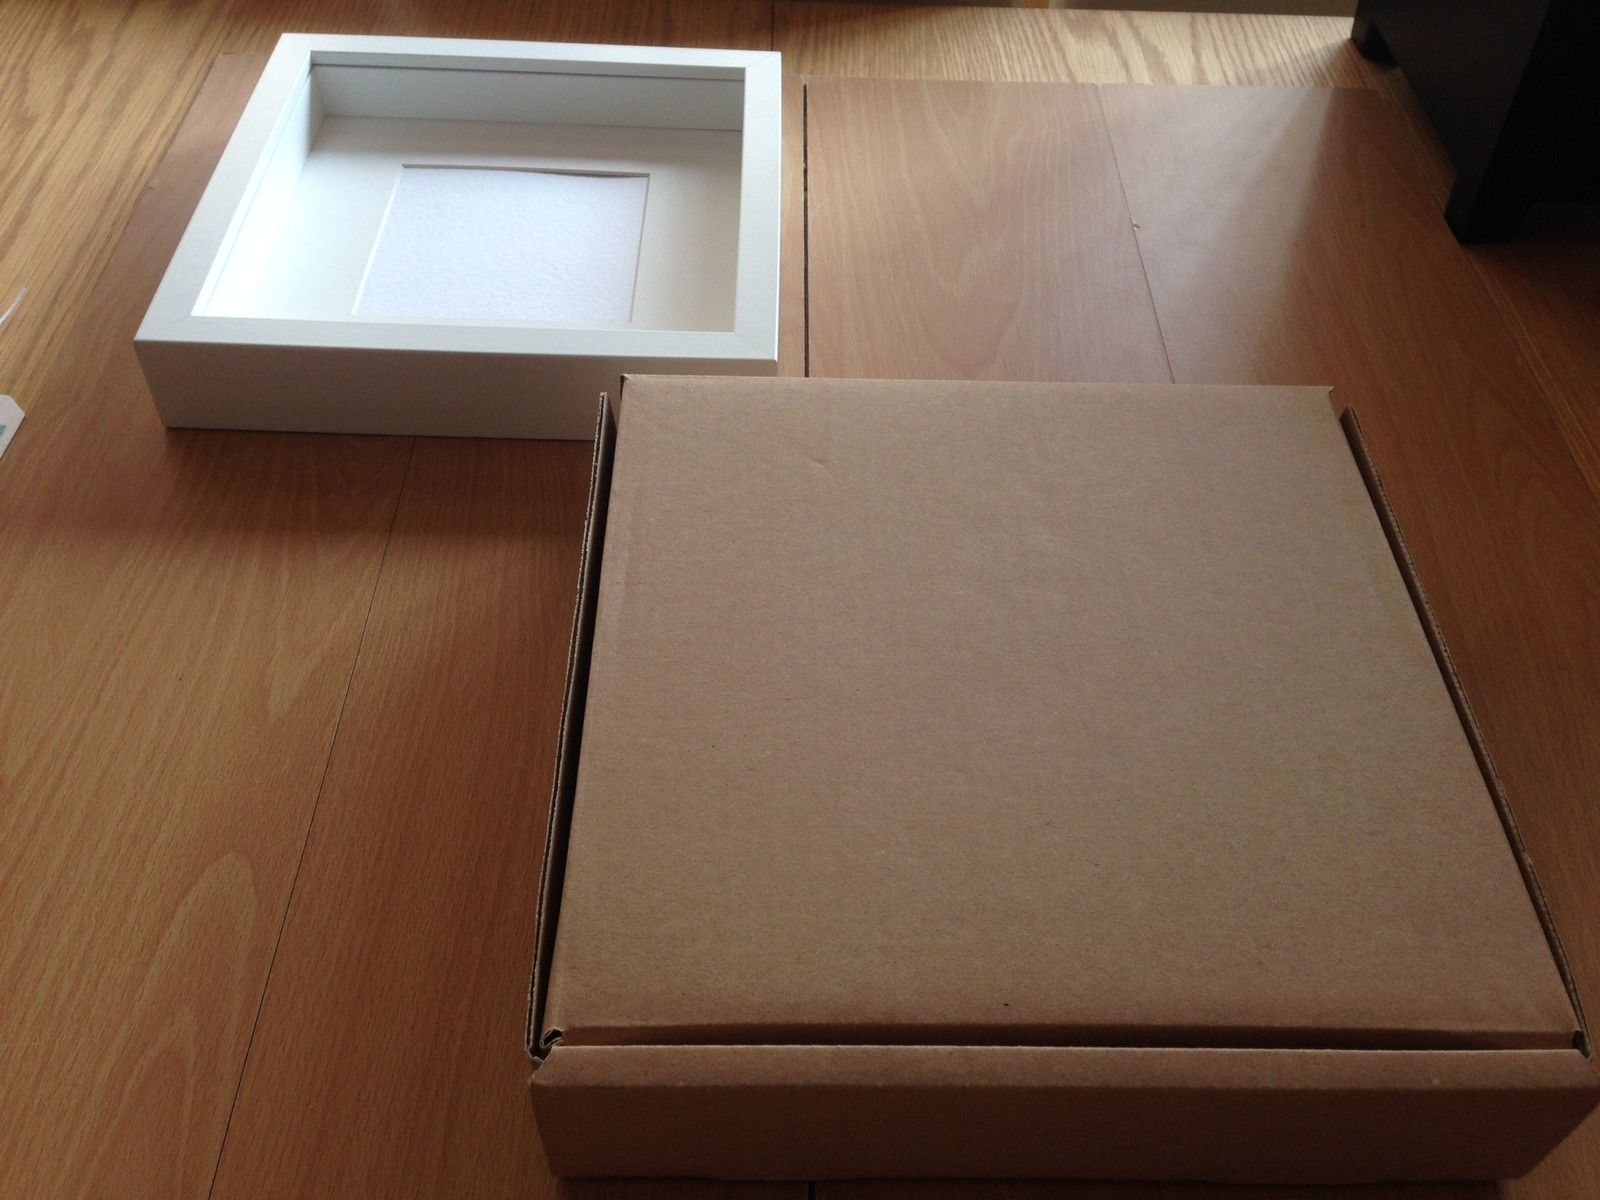 25 X 4 5cm Cardboard Packaging Postal Box For Ikea Deep Picture Frame Etc Ebay